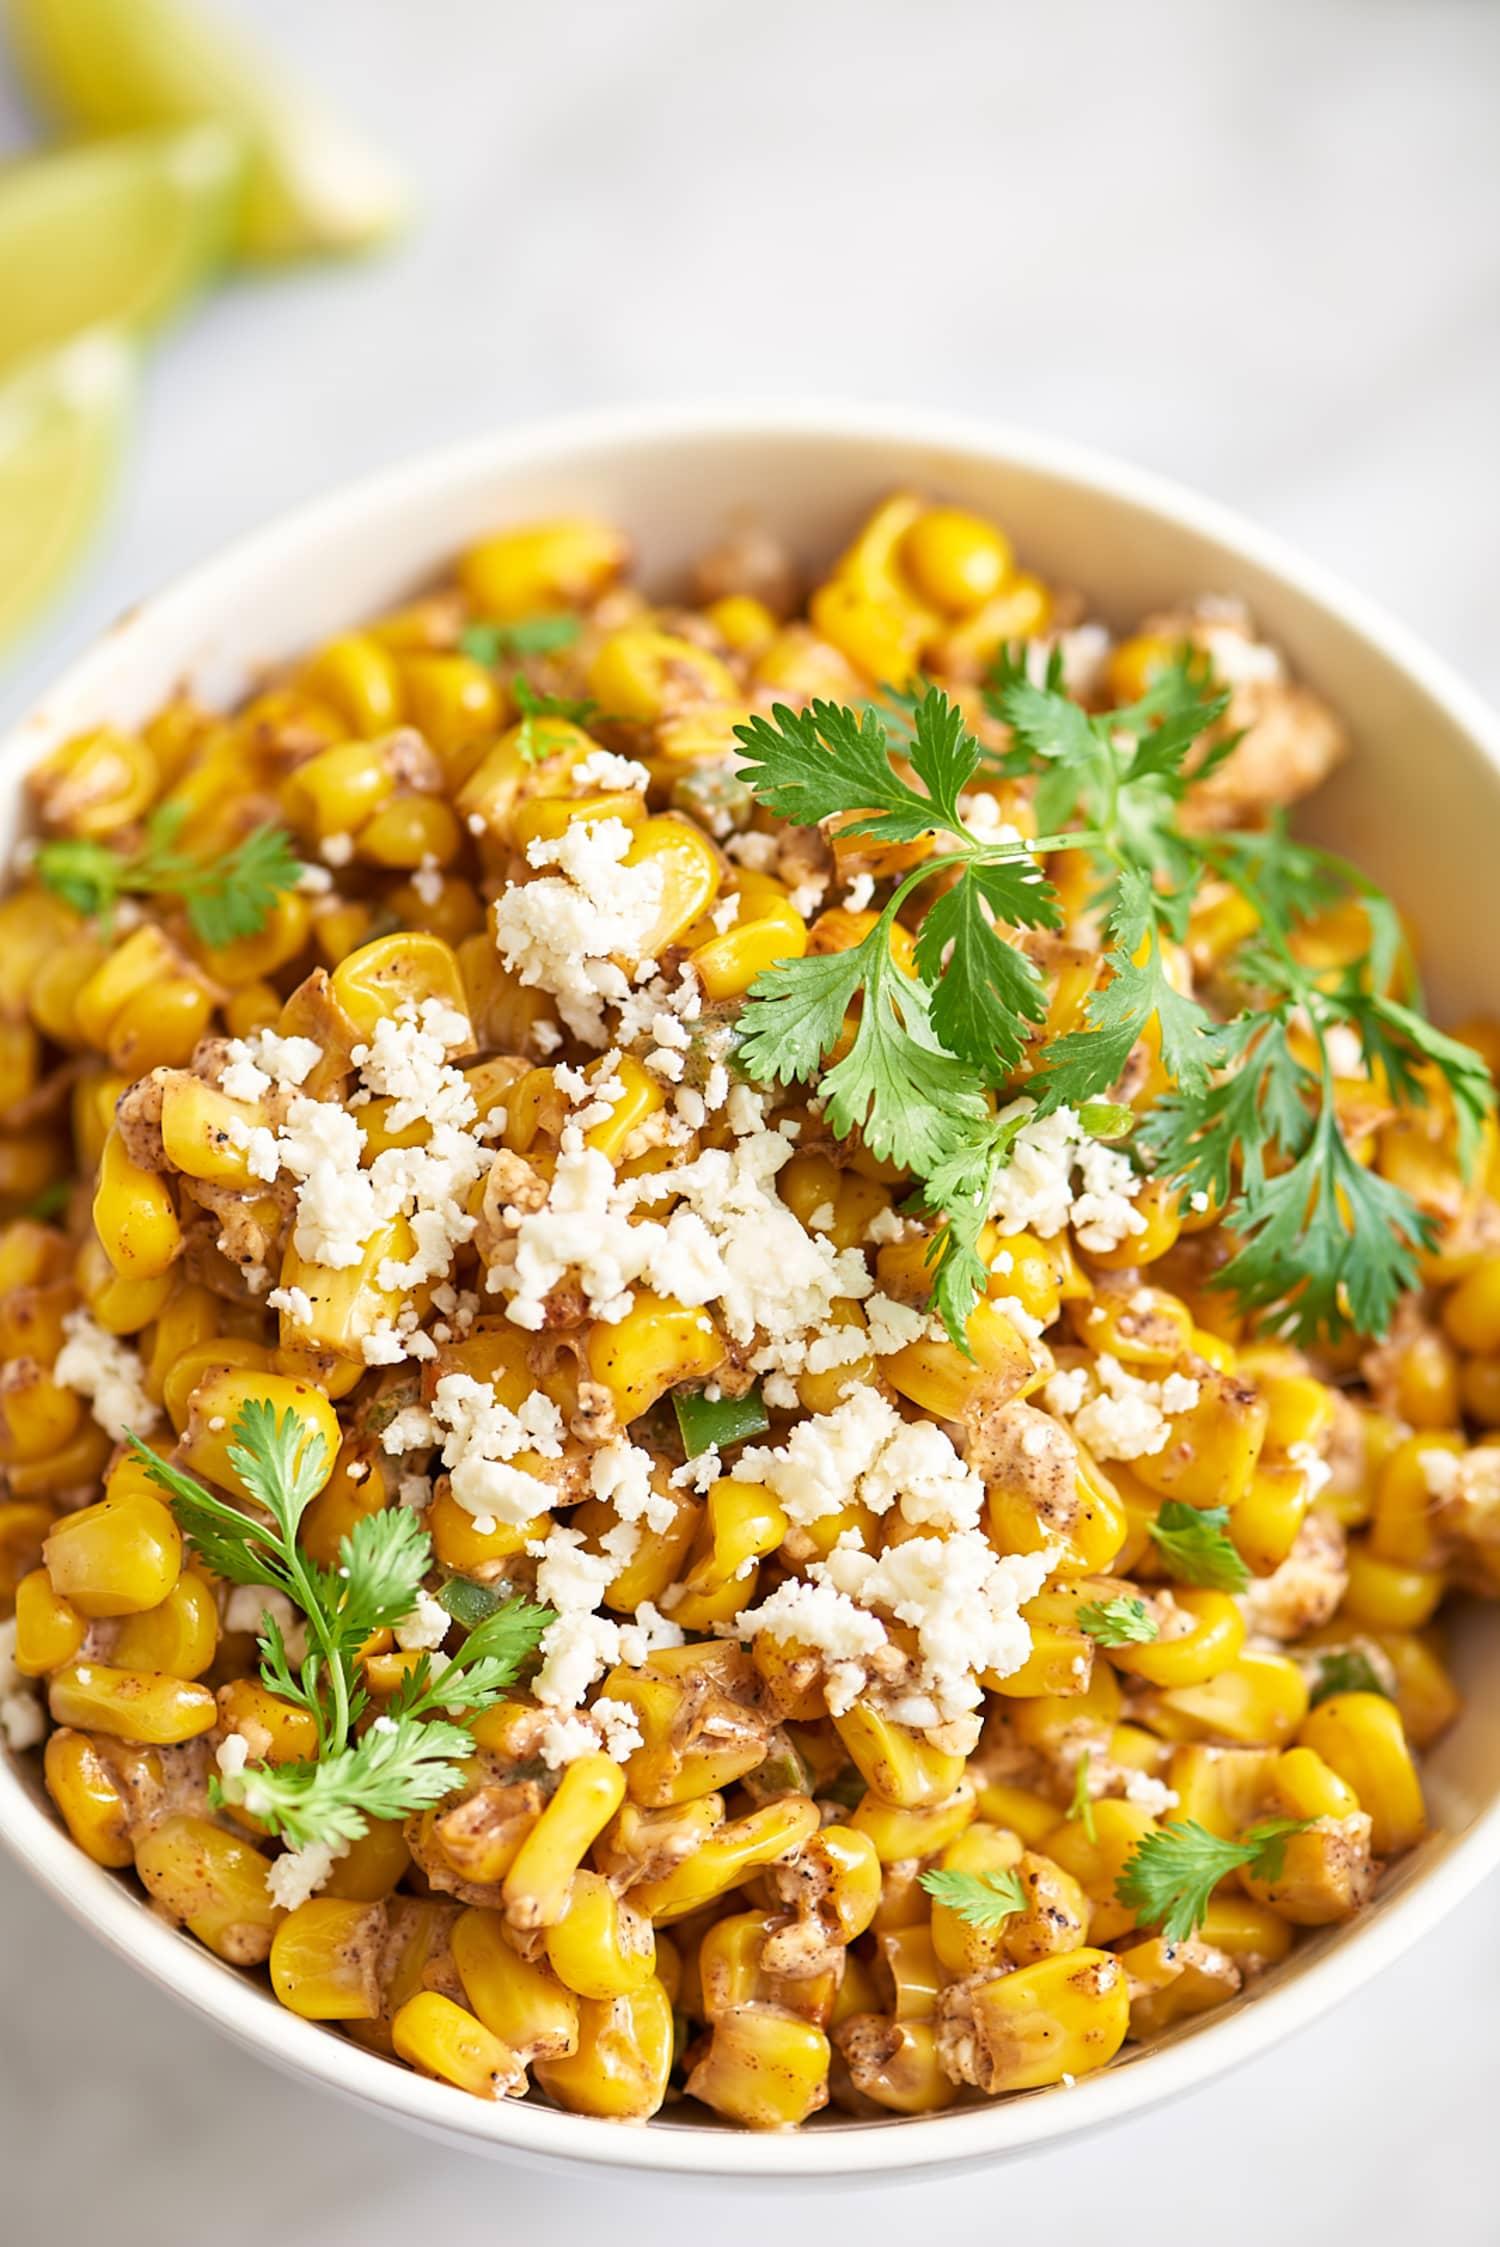 Corn Side Dishes - Easy Corn Recipes | Kitchn